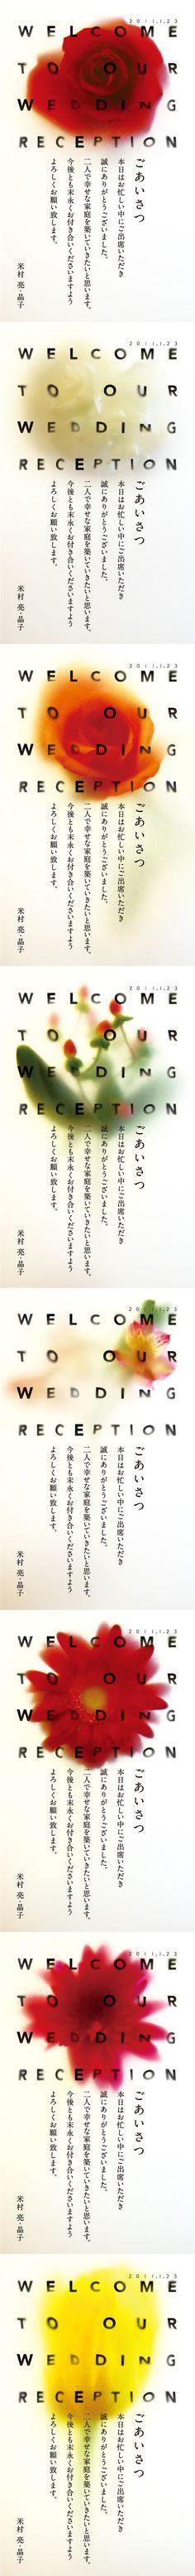 shun yonemura  ryowedding thankscard Sheet Music, It Works, Graphic Design, Nailed It, Music Sheets, Visual Communication